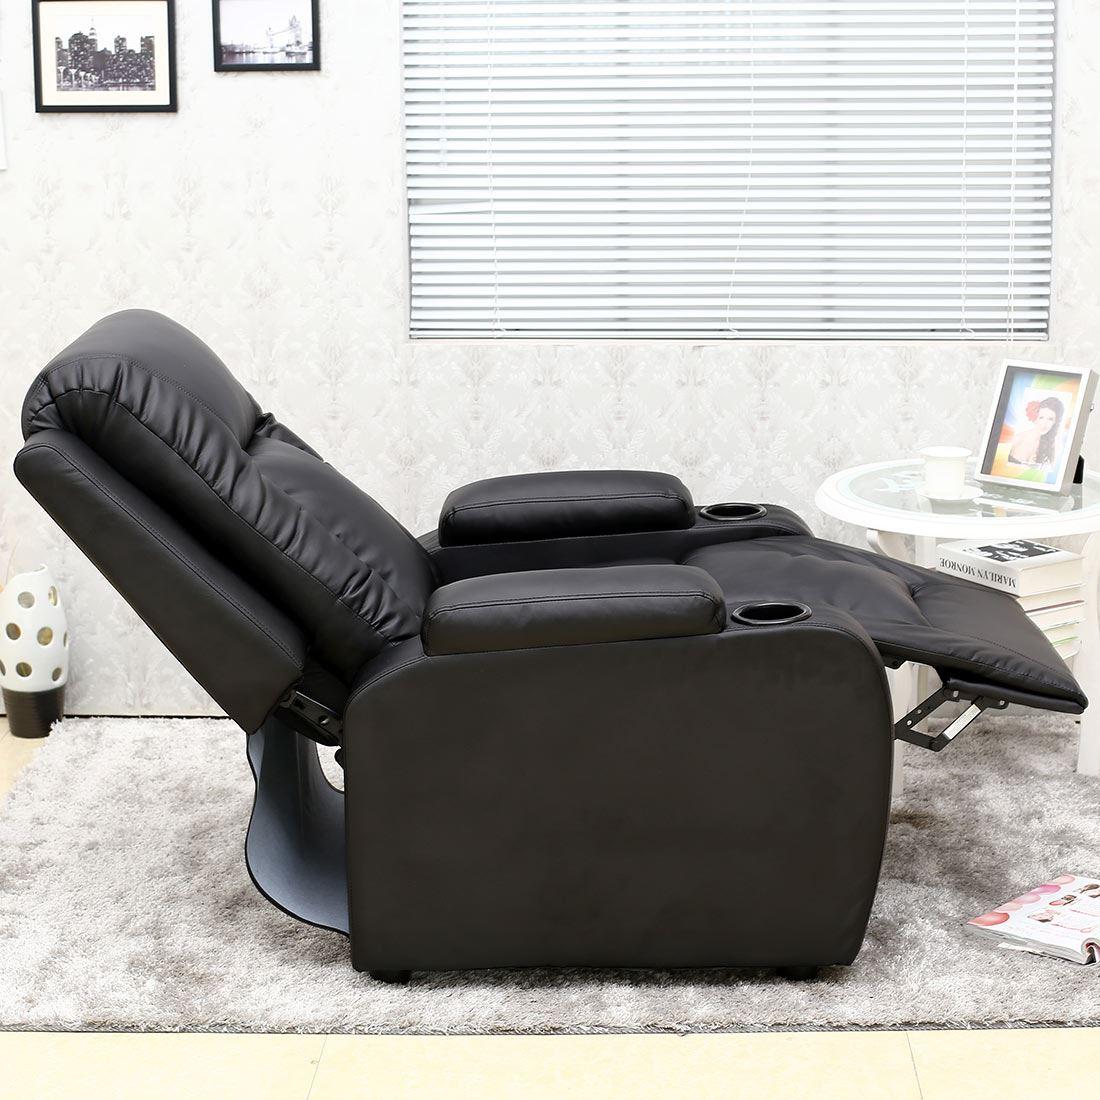 sofa armchair drink holder caddy woodmark standard sofas oscar black leather recliner w holders